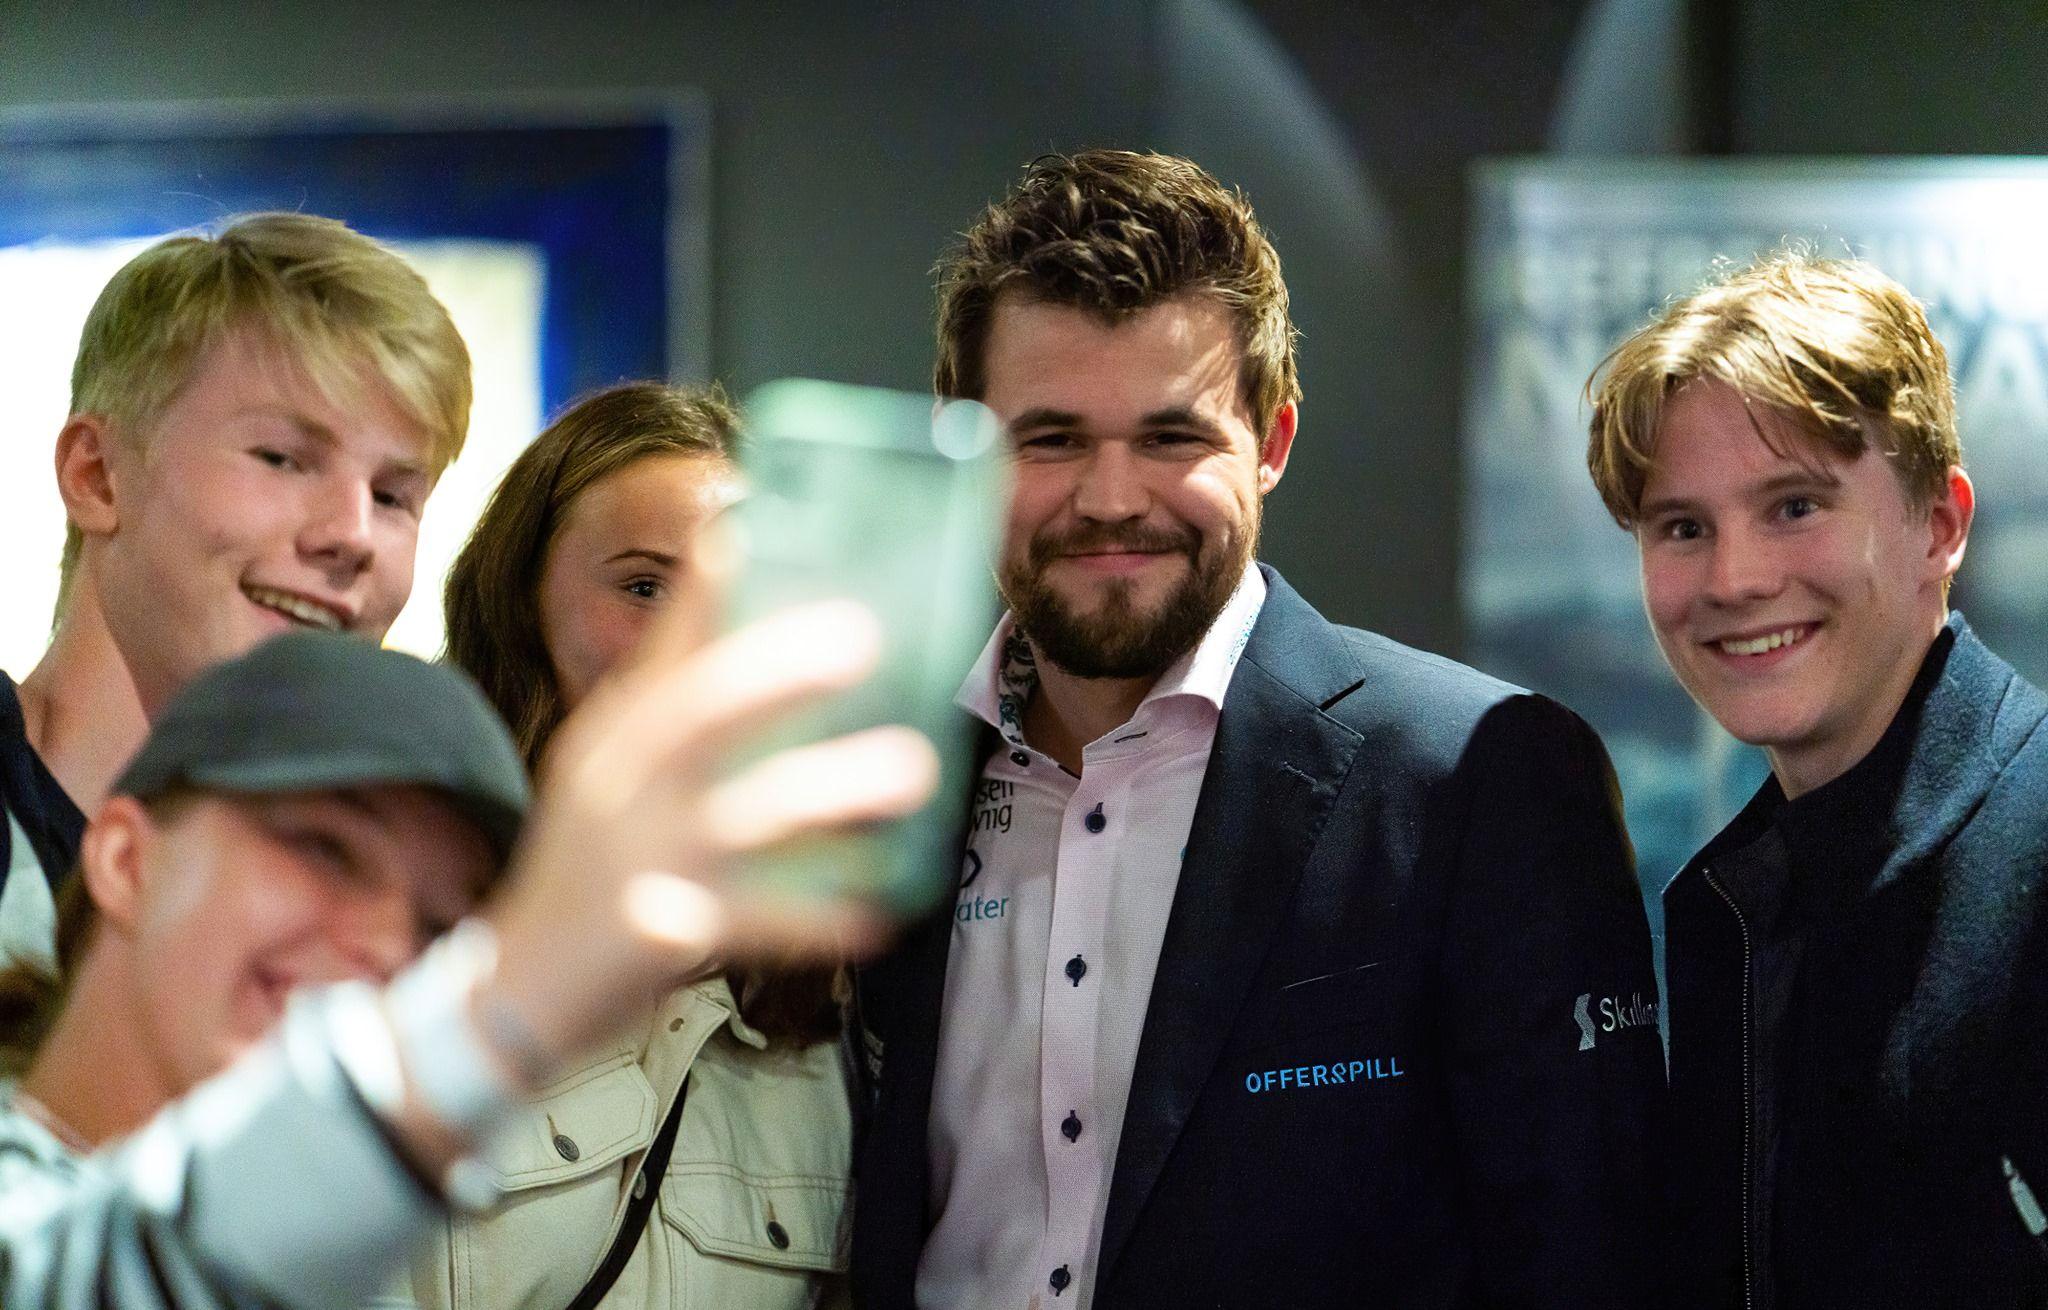 Selfie Magnus Carlsen